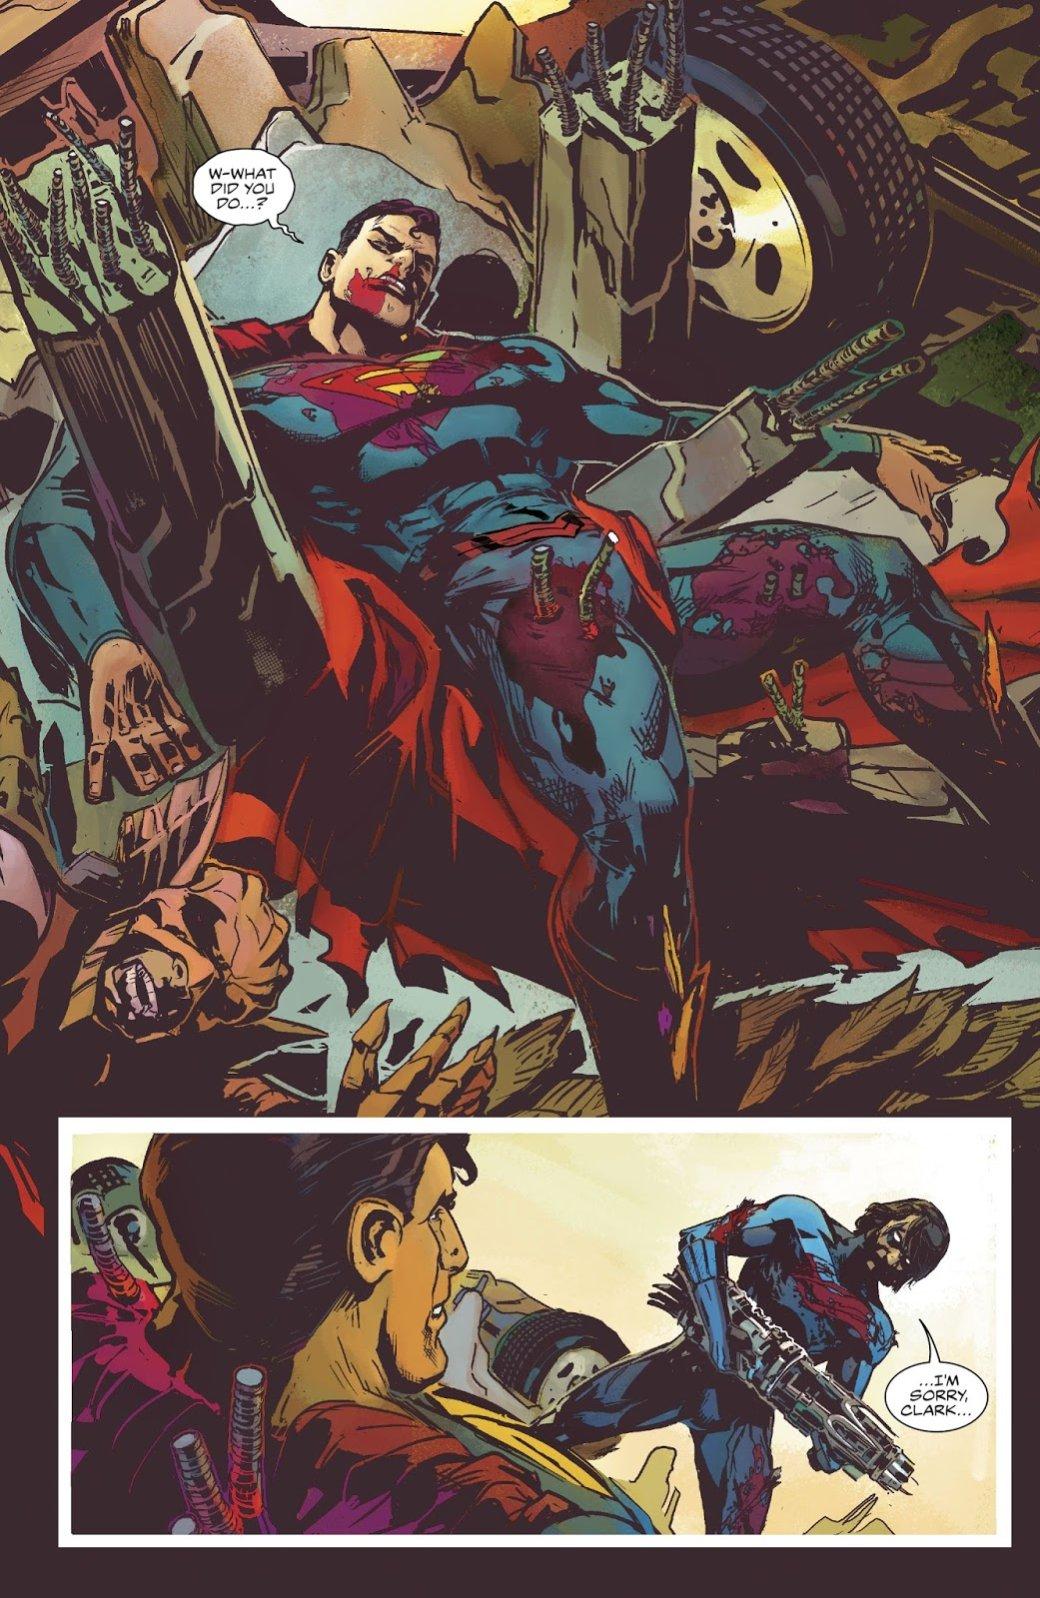 Открытия 2017— комиксы: Star-Lord, Infamous Iron Man, Batman: The White Knight. - Изображение 8